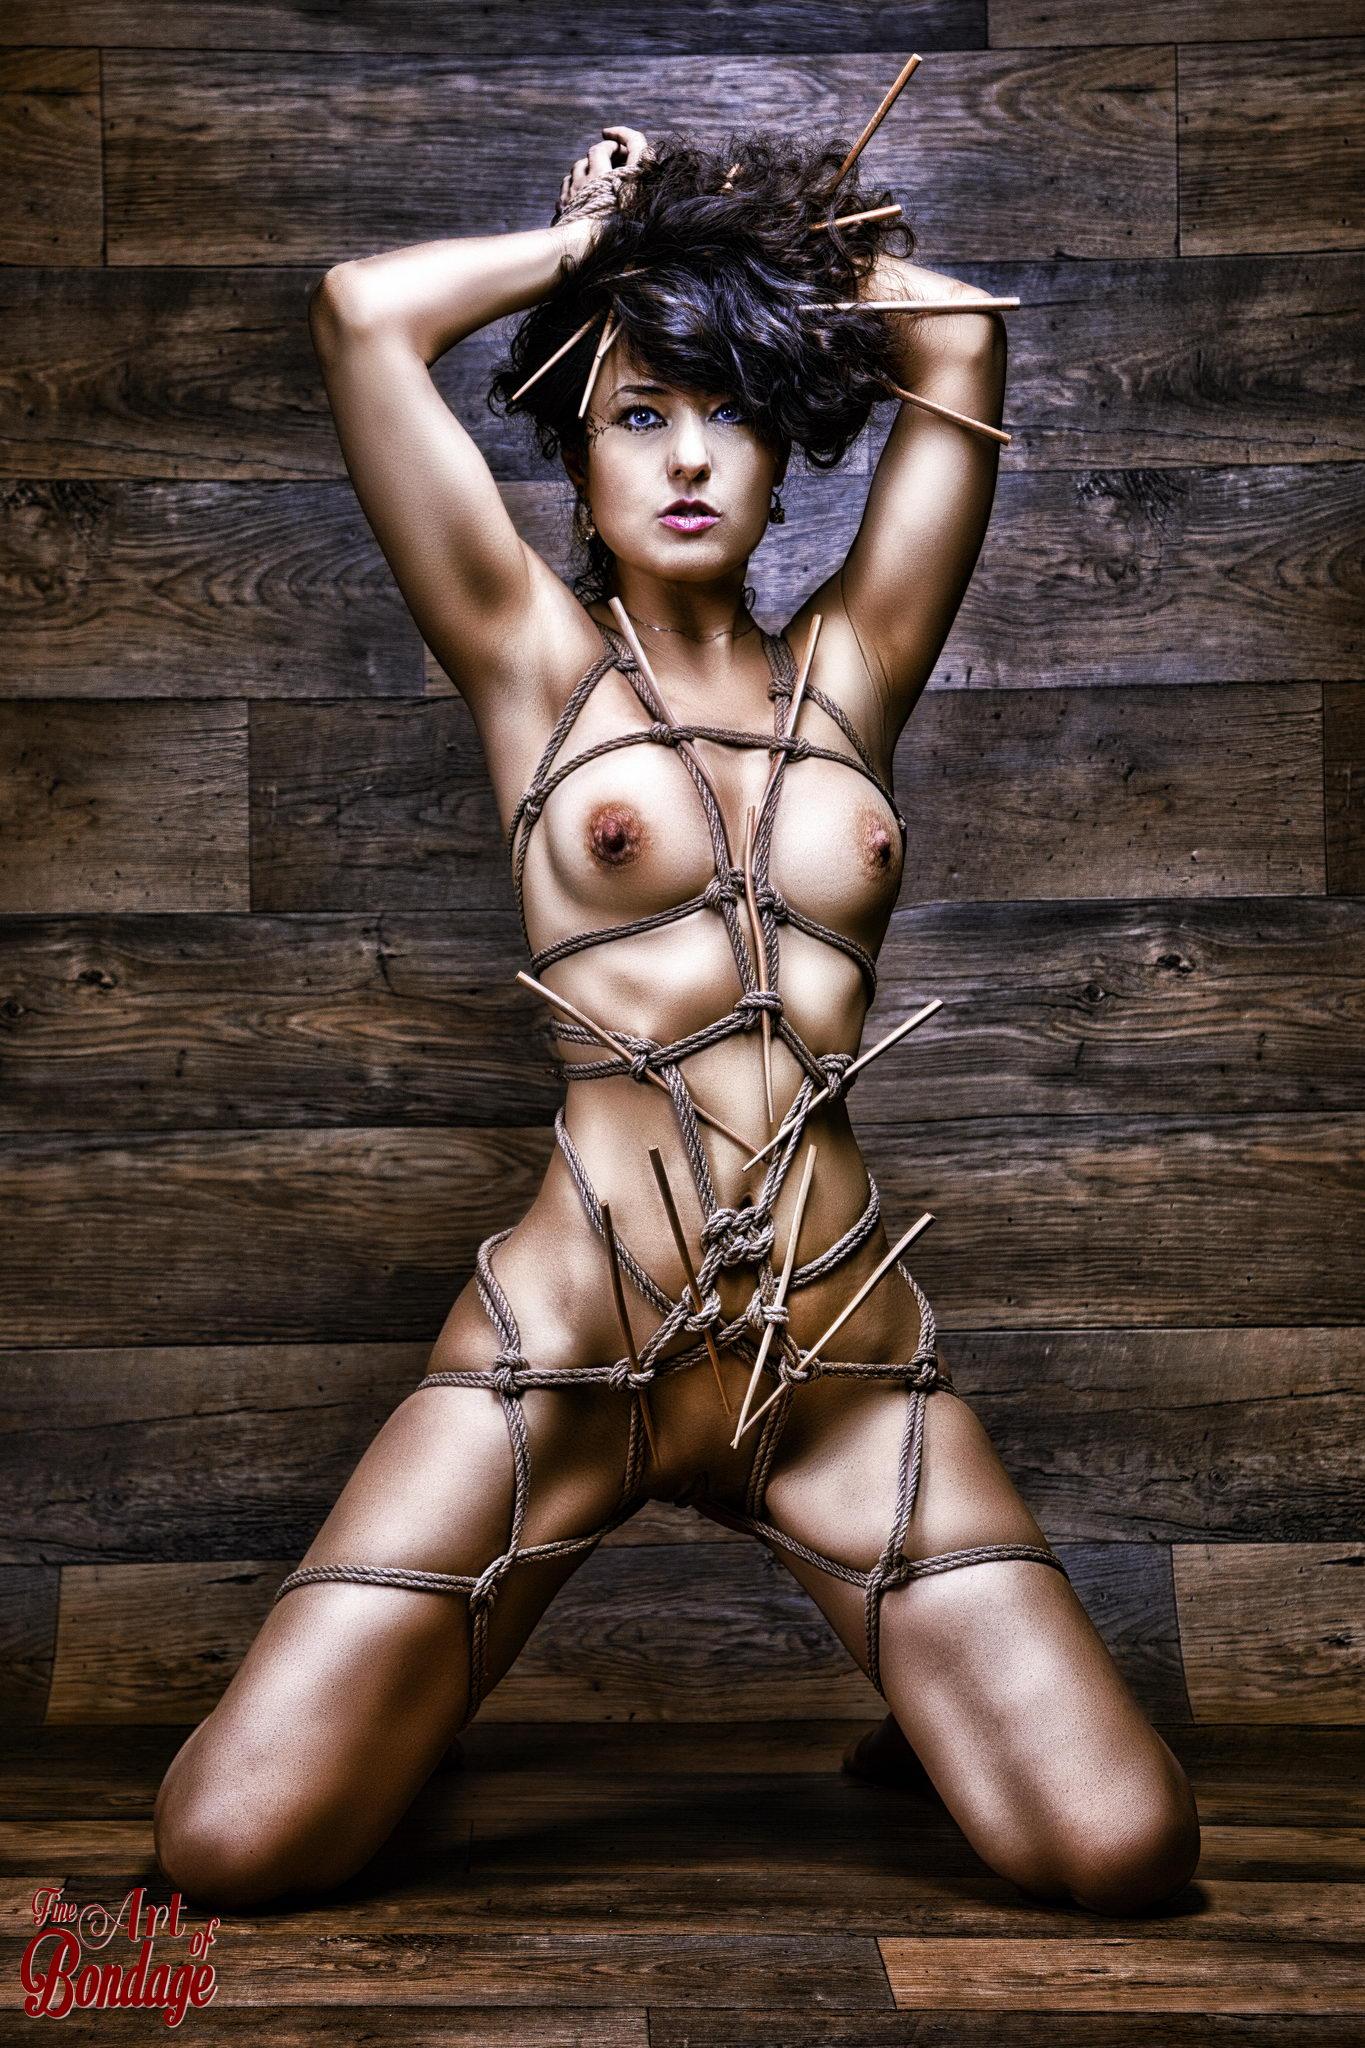 2251 - Harness, Bamboo Sticks